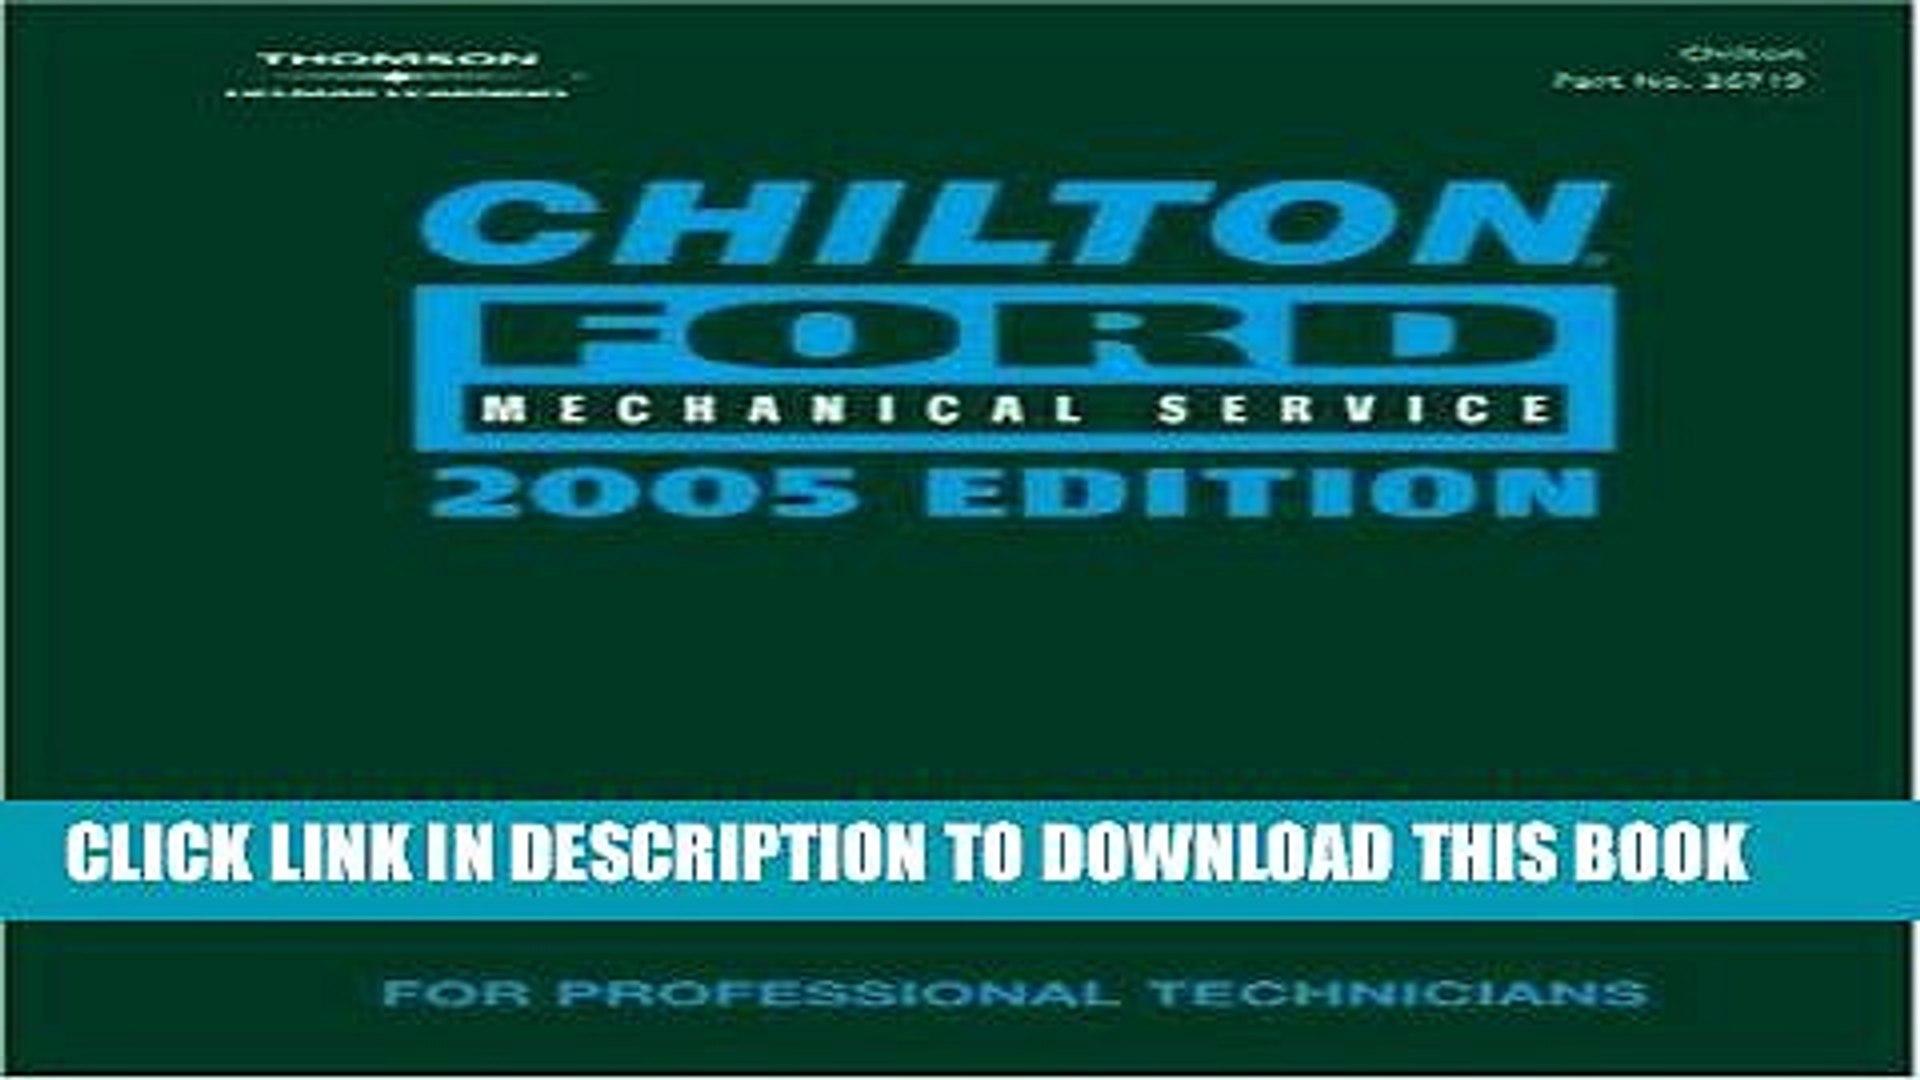 [PDF] Chilton 2005 Ford Mechanical Service Manual: (2001-2005) Popular Online